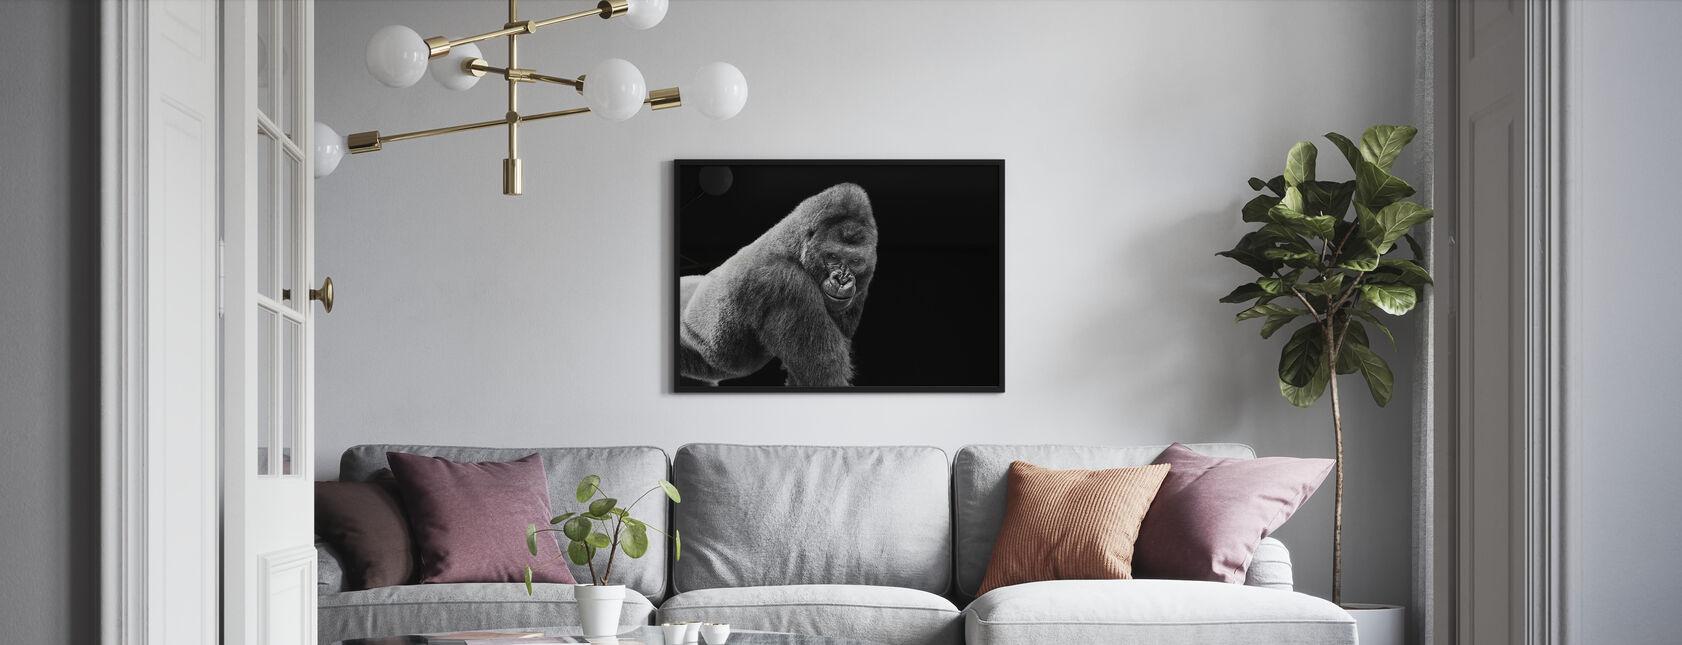 Adult Gorilla - Poster - Living Room